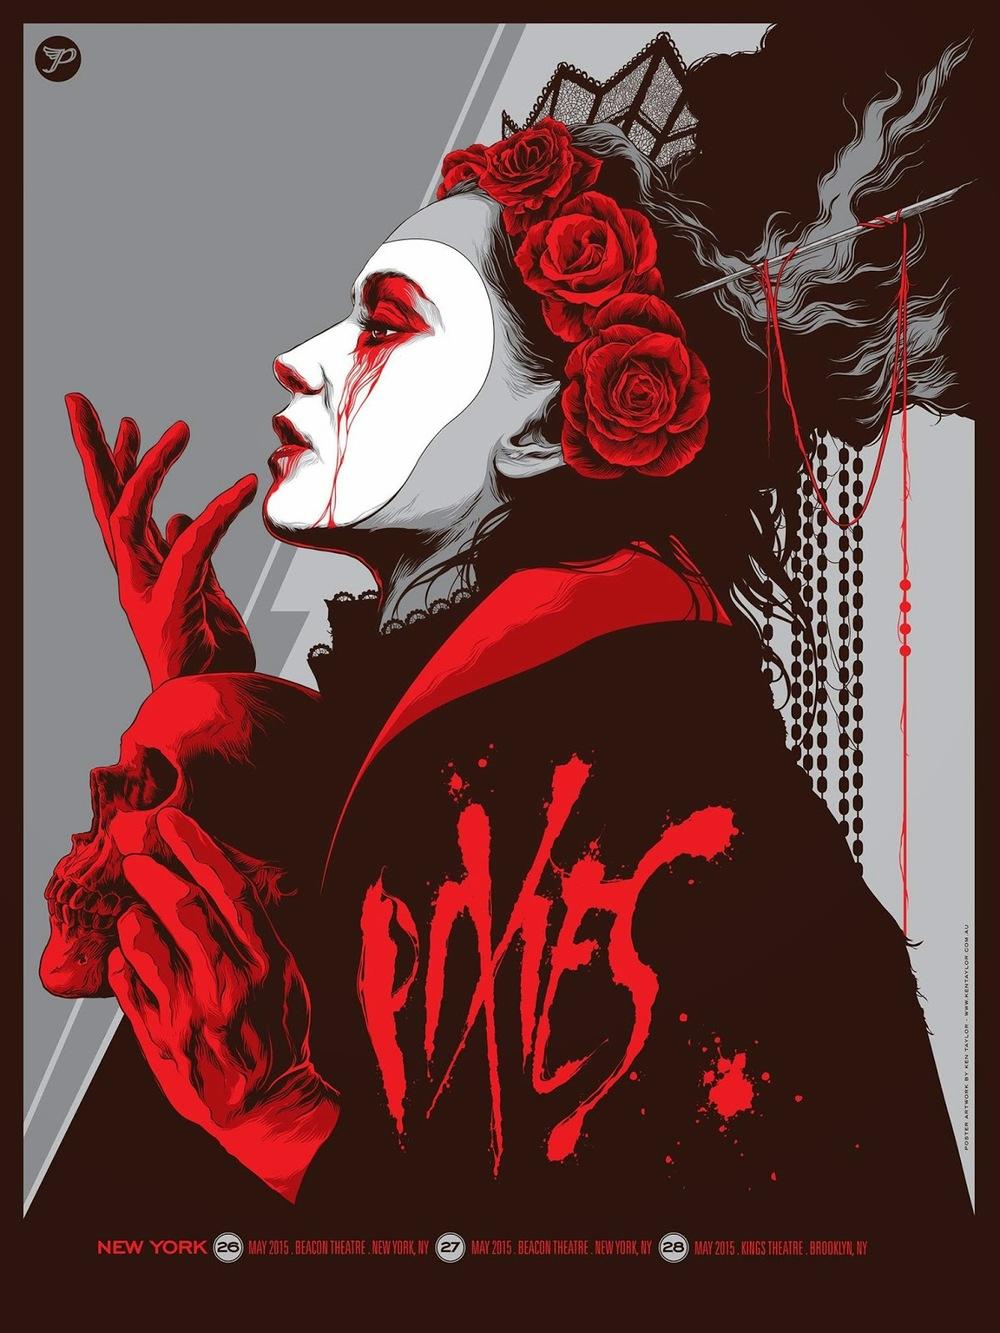 Ken-Taylor-Pixies-New-York-Poster-2015.jpg